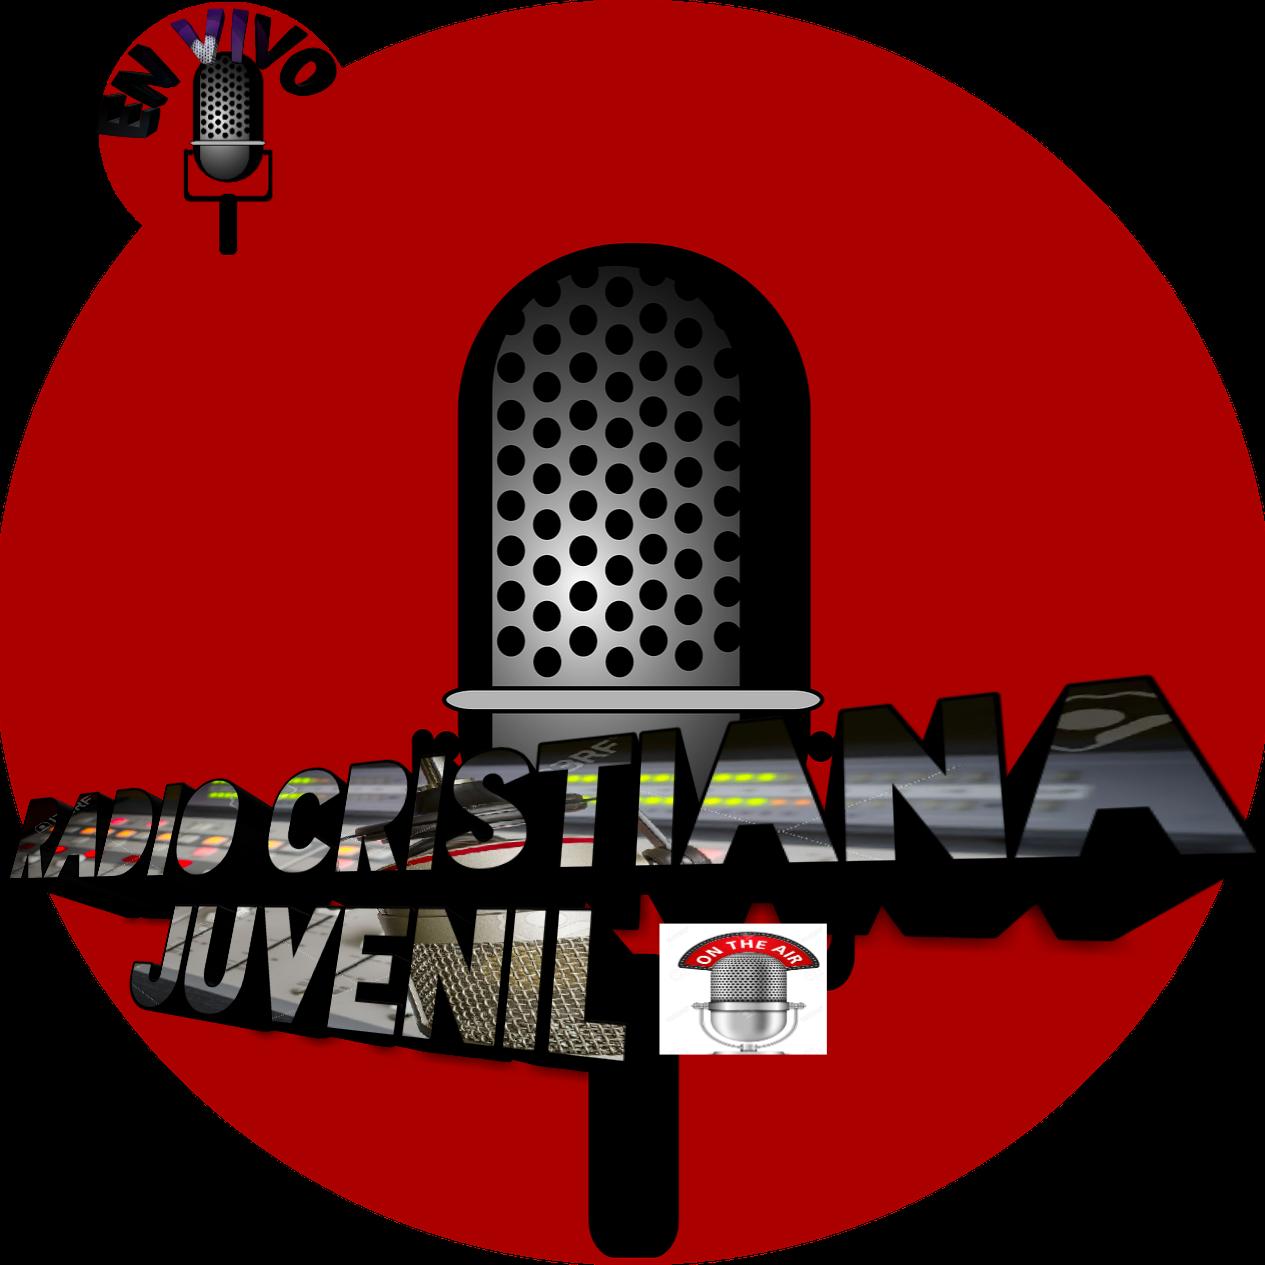 Radio Cristiana Juvenil